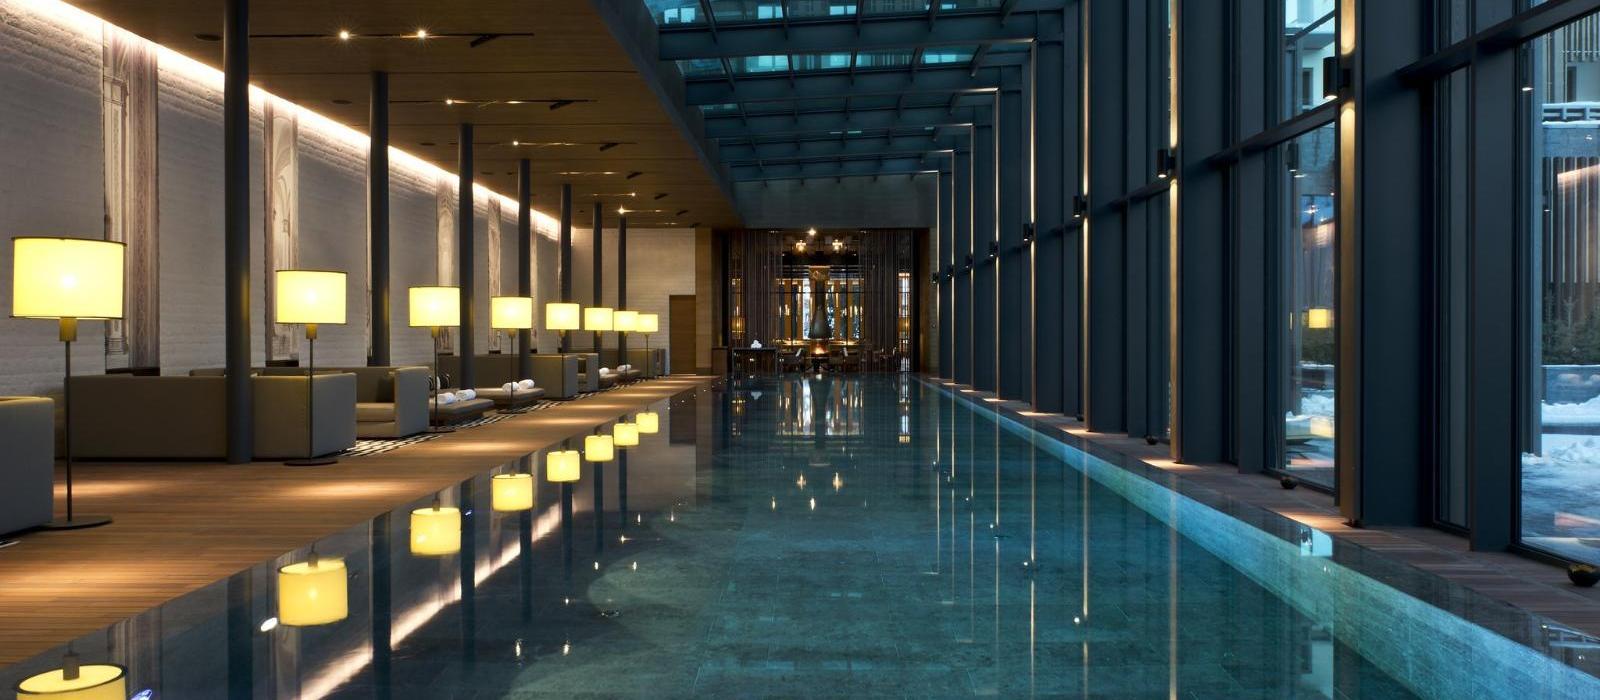 安德马特CHEDI度假酒店(The Chedi Andermatt) 图片  www.lhw.cn